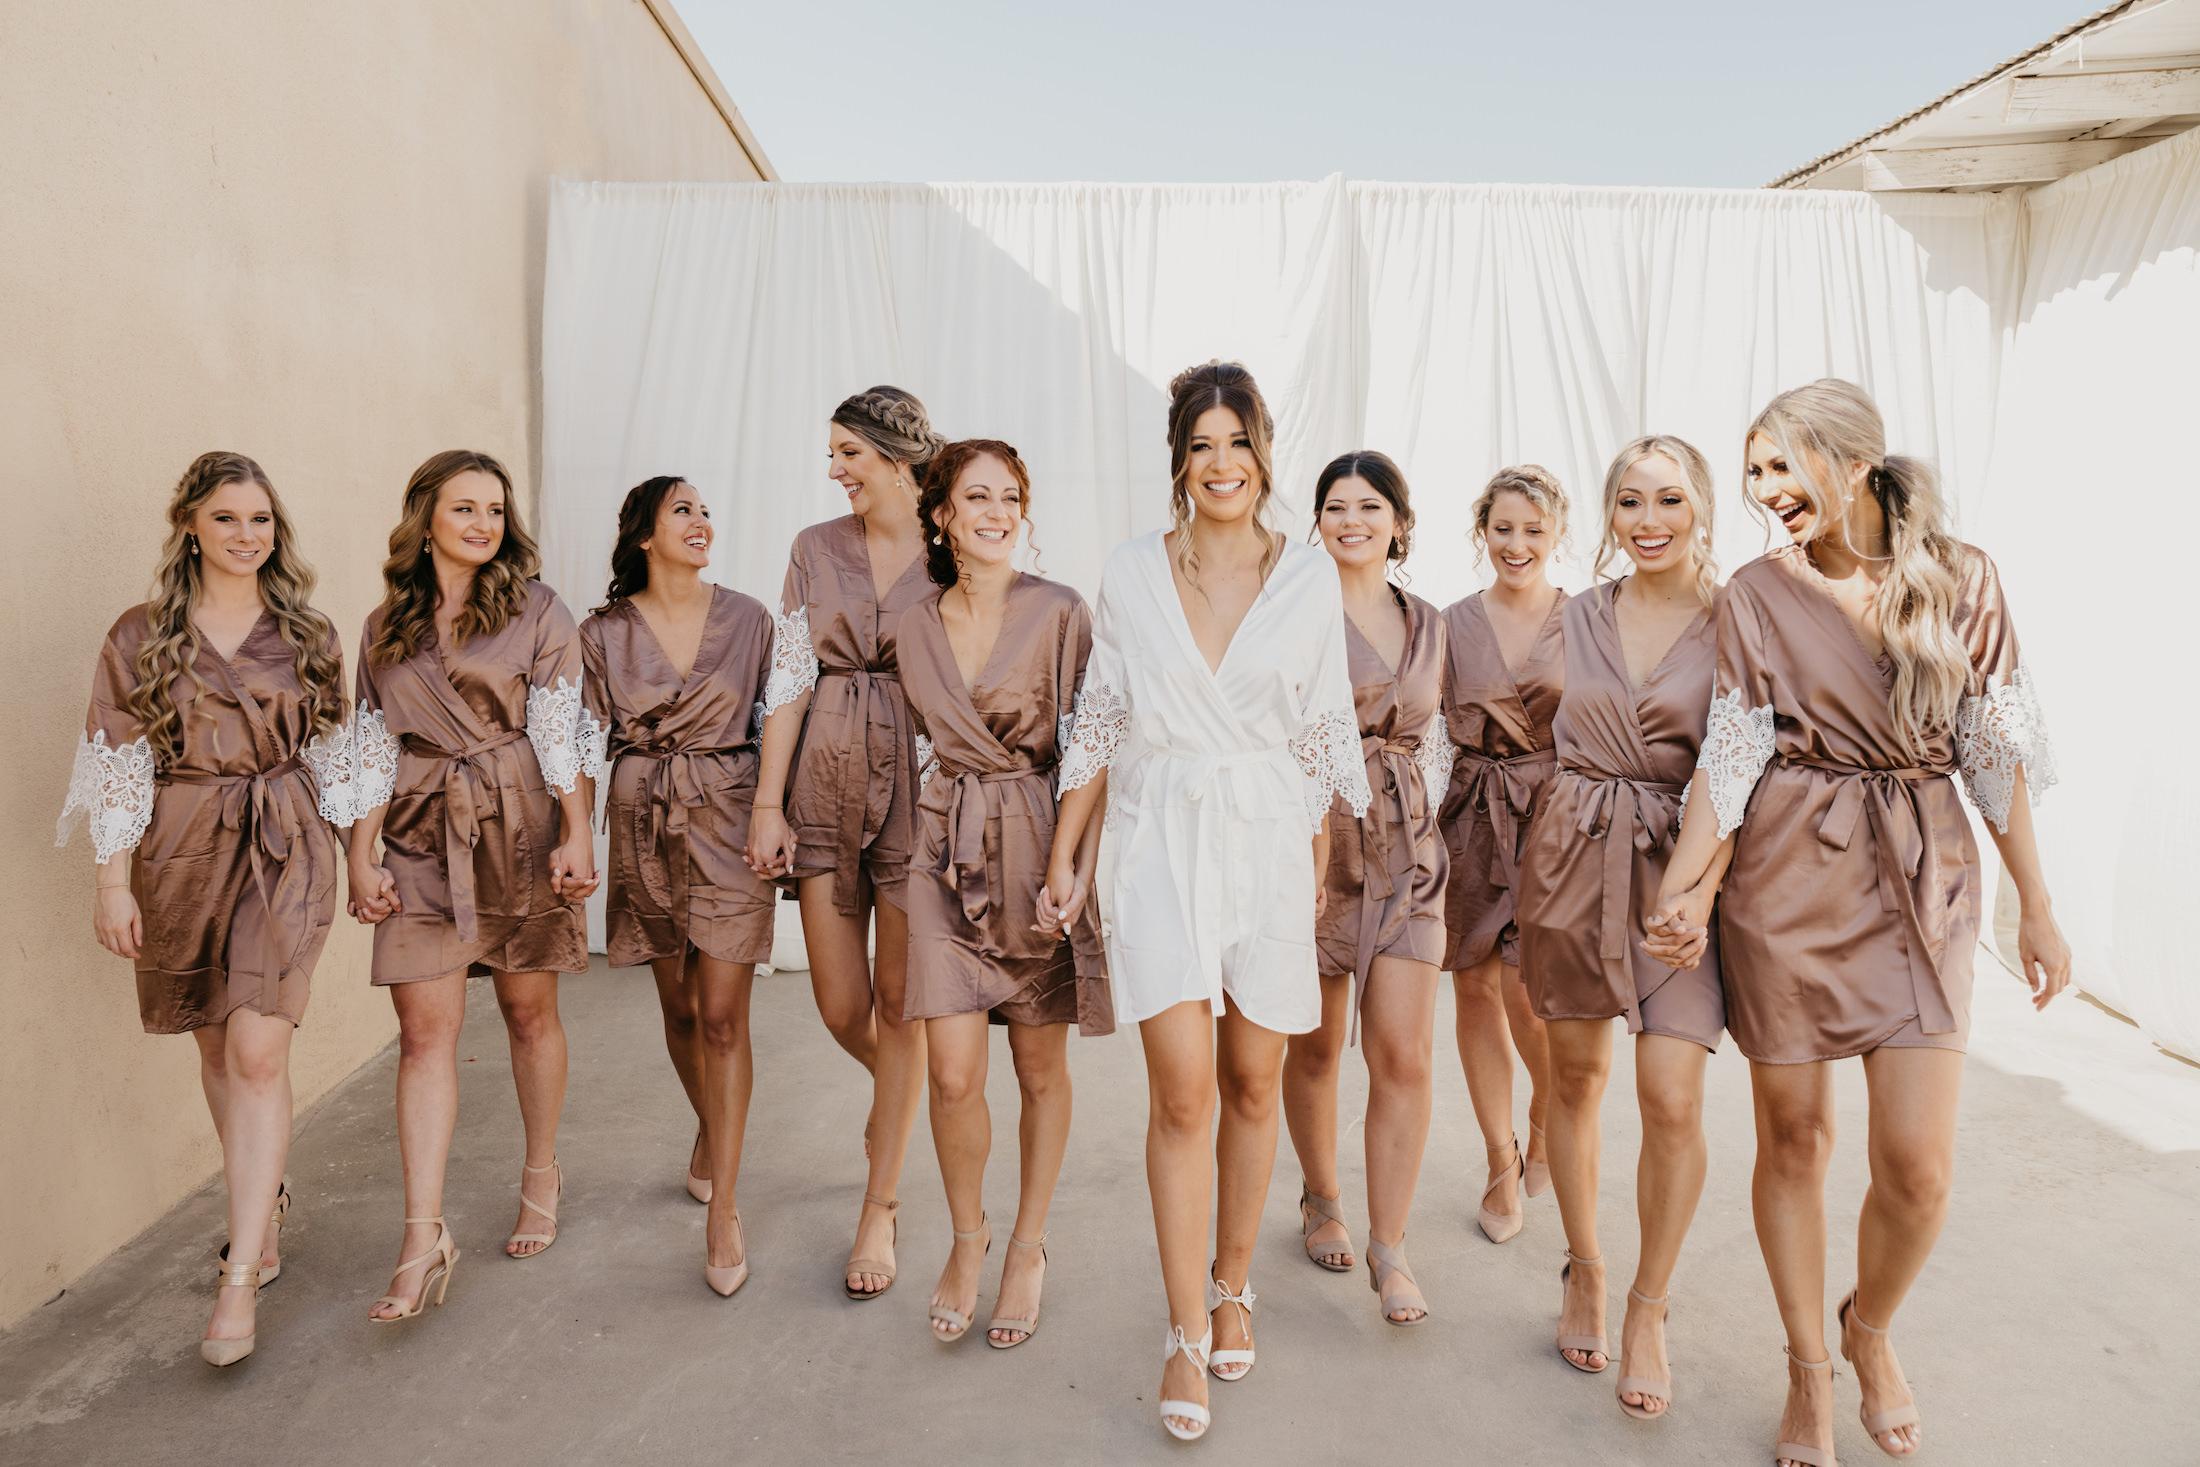 Bride and bridesmaids, image by Fatima Elreda Photo